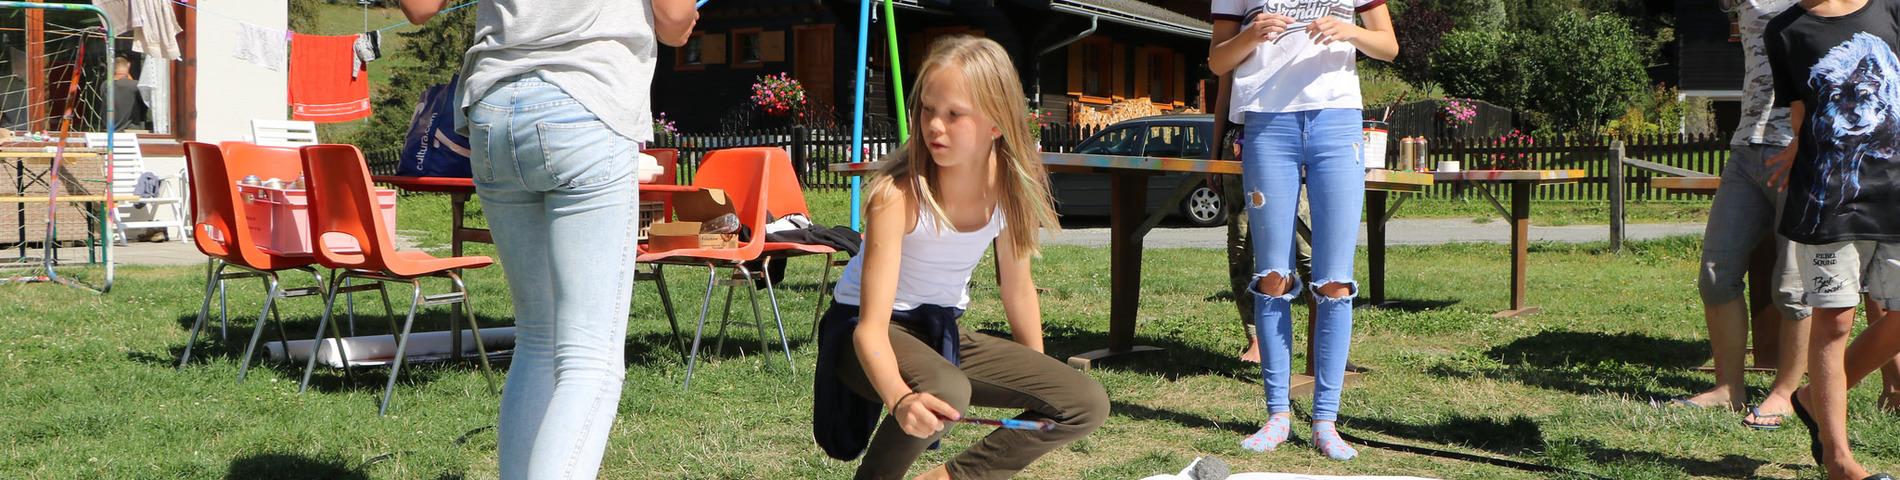 friLingue Language Camps foto 1